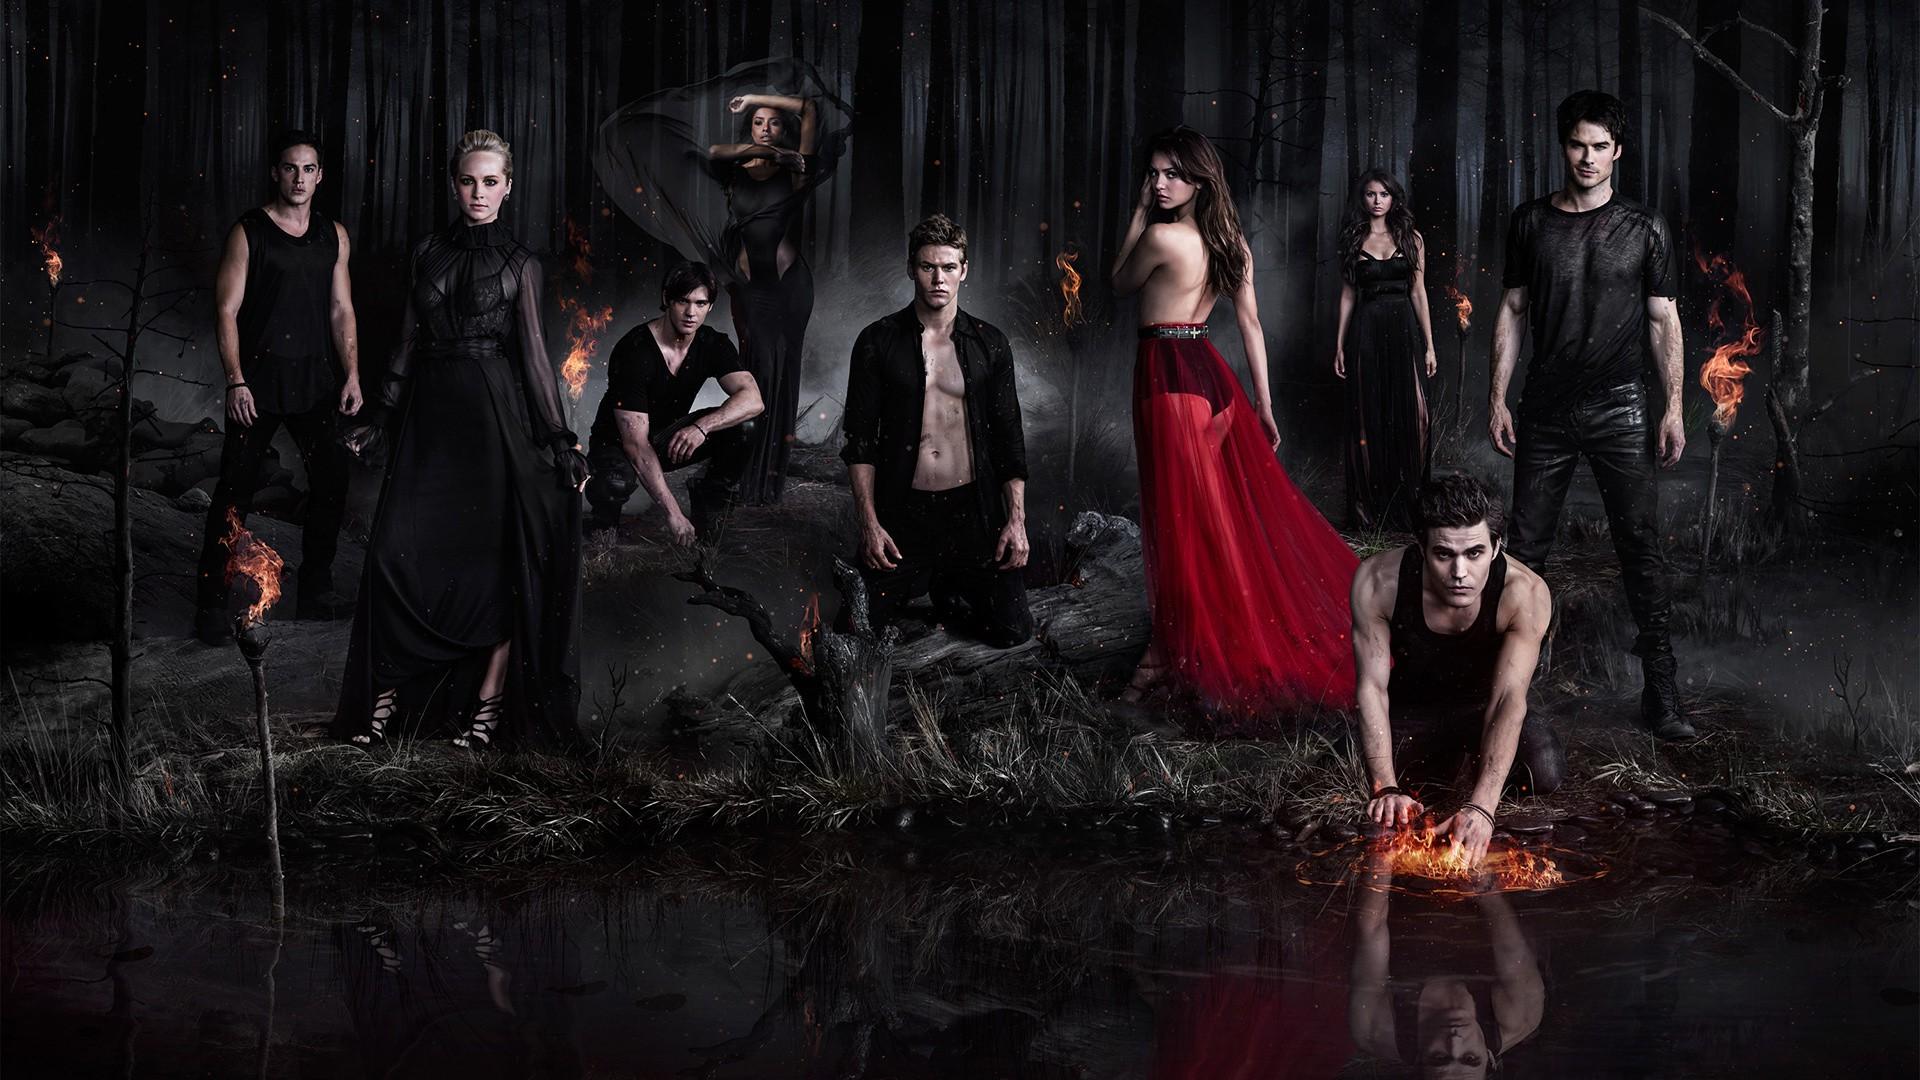 wallpaper fashion midnight nina dobrev the vampire diaries rh wallhere com